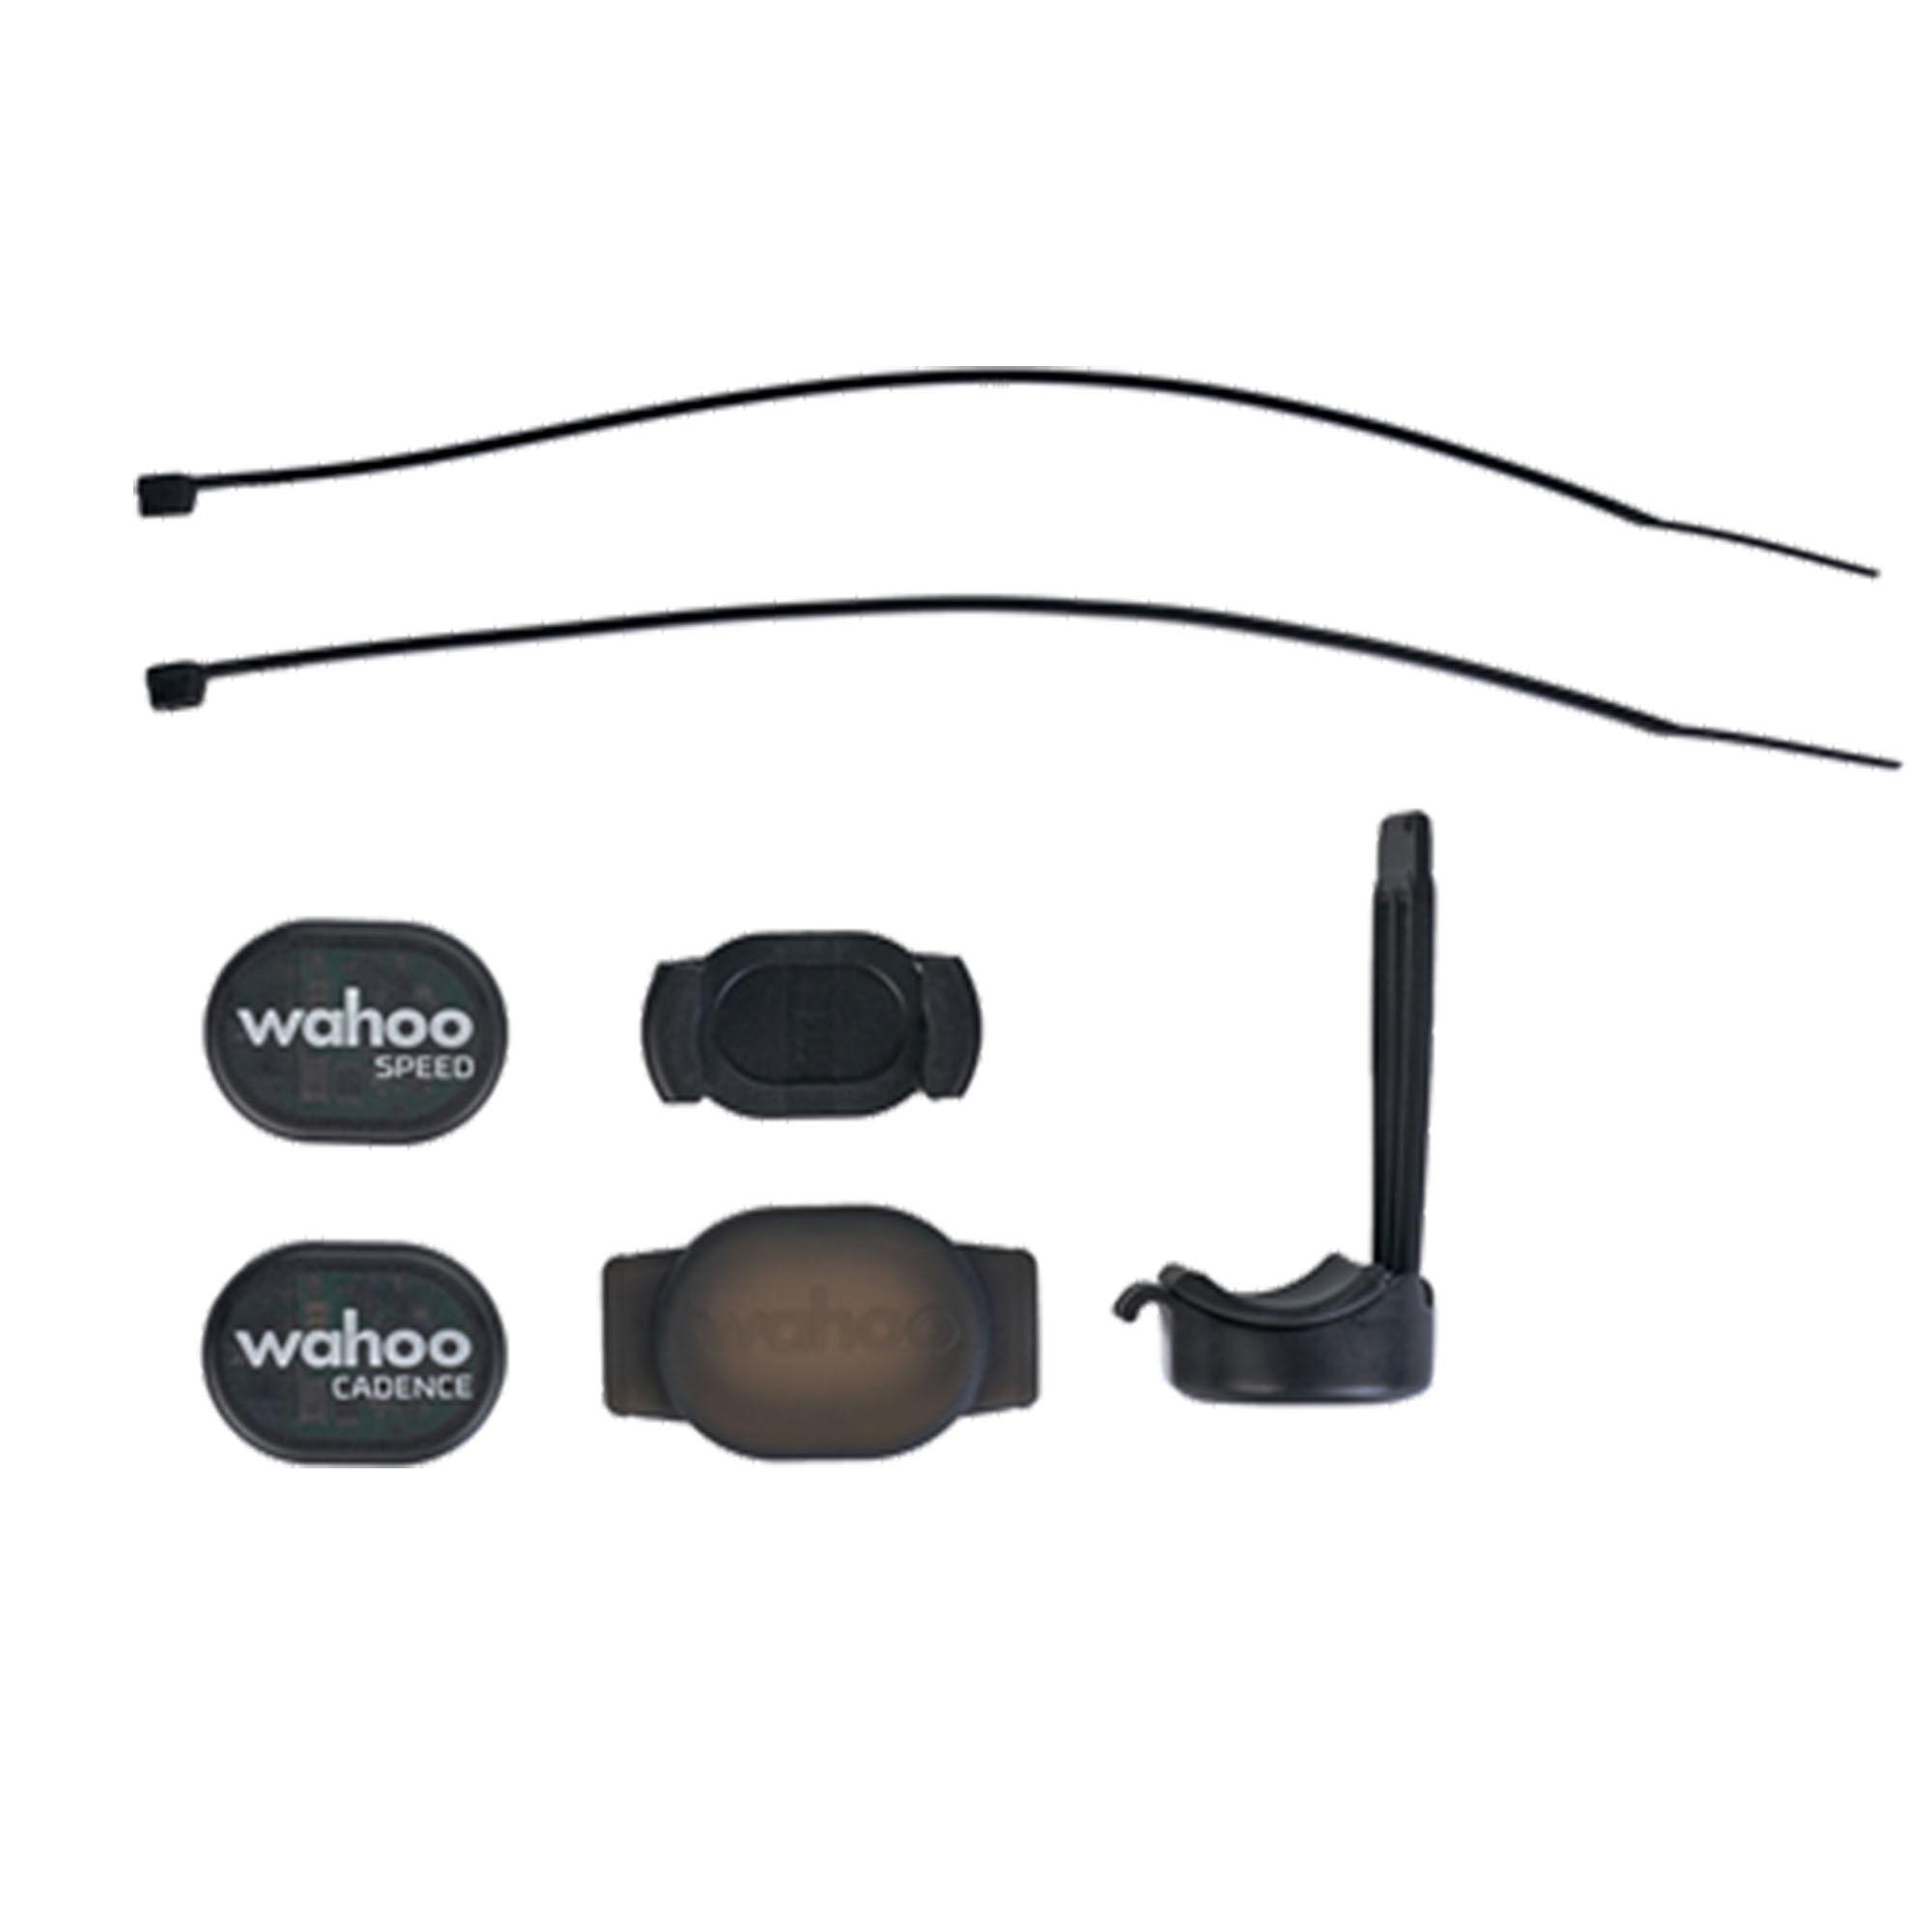 Wahoo Fitness RPM Speed And Cadence Sensor Bundle  - Black - Size: One Size